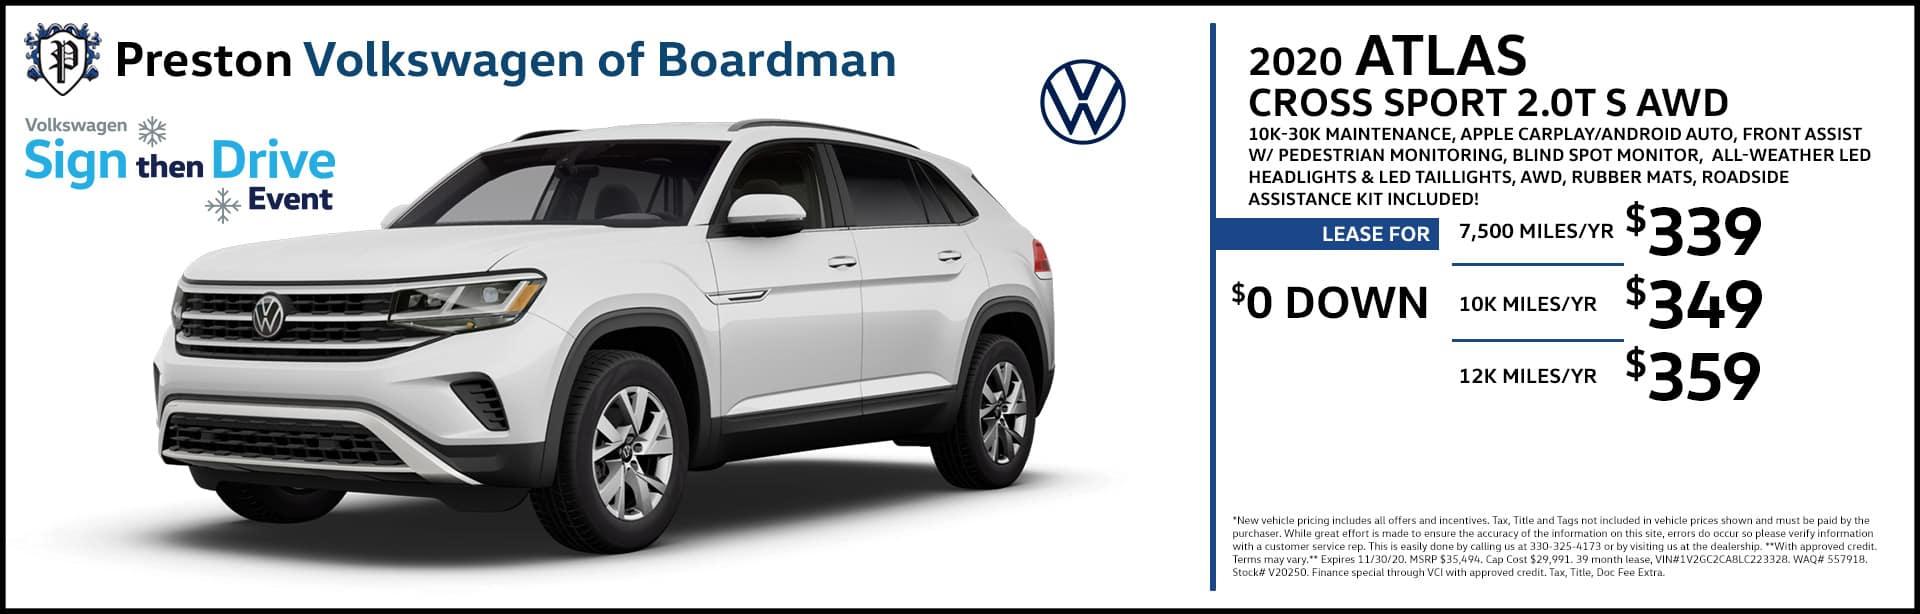 November special on the 2020 Volkswagen Atlas Cross Sport